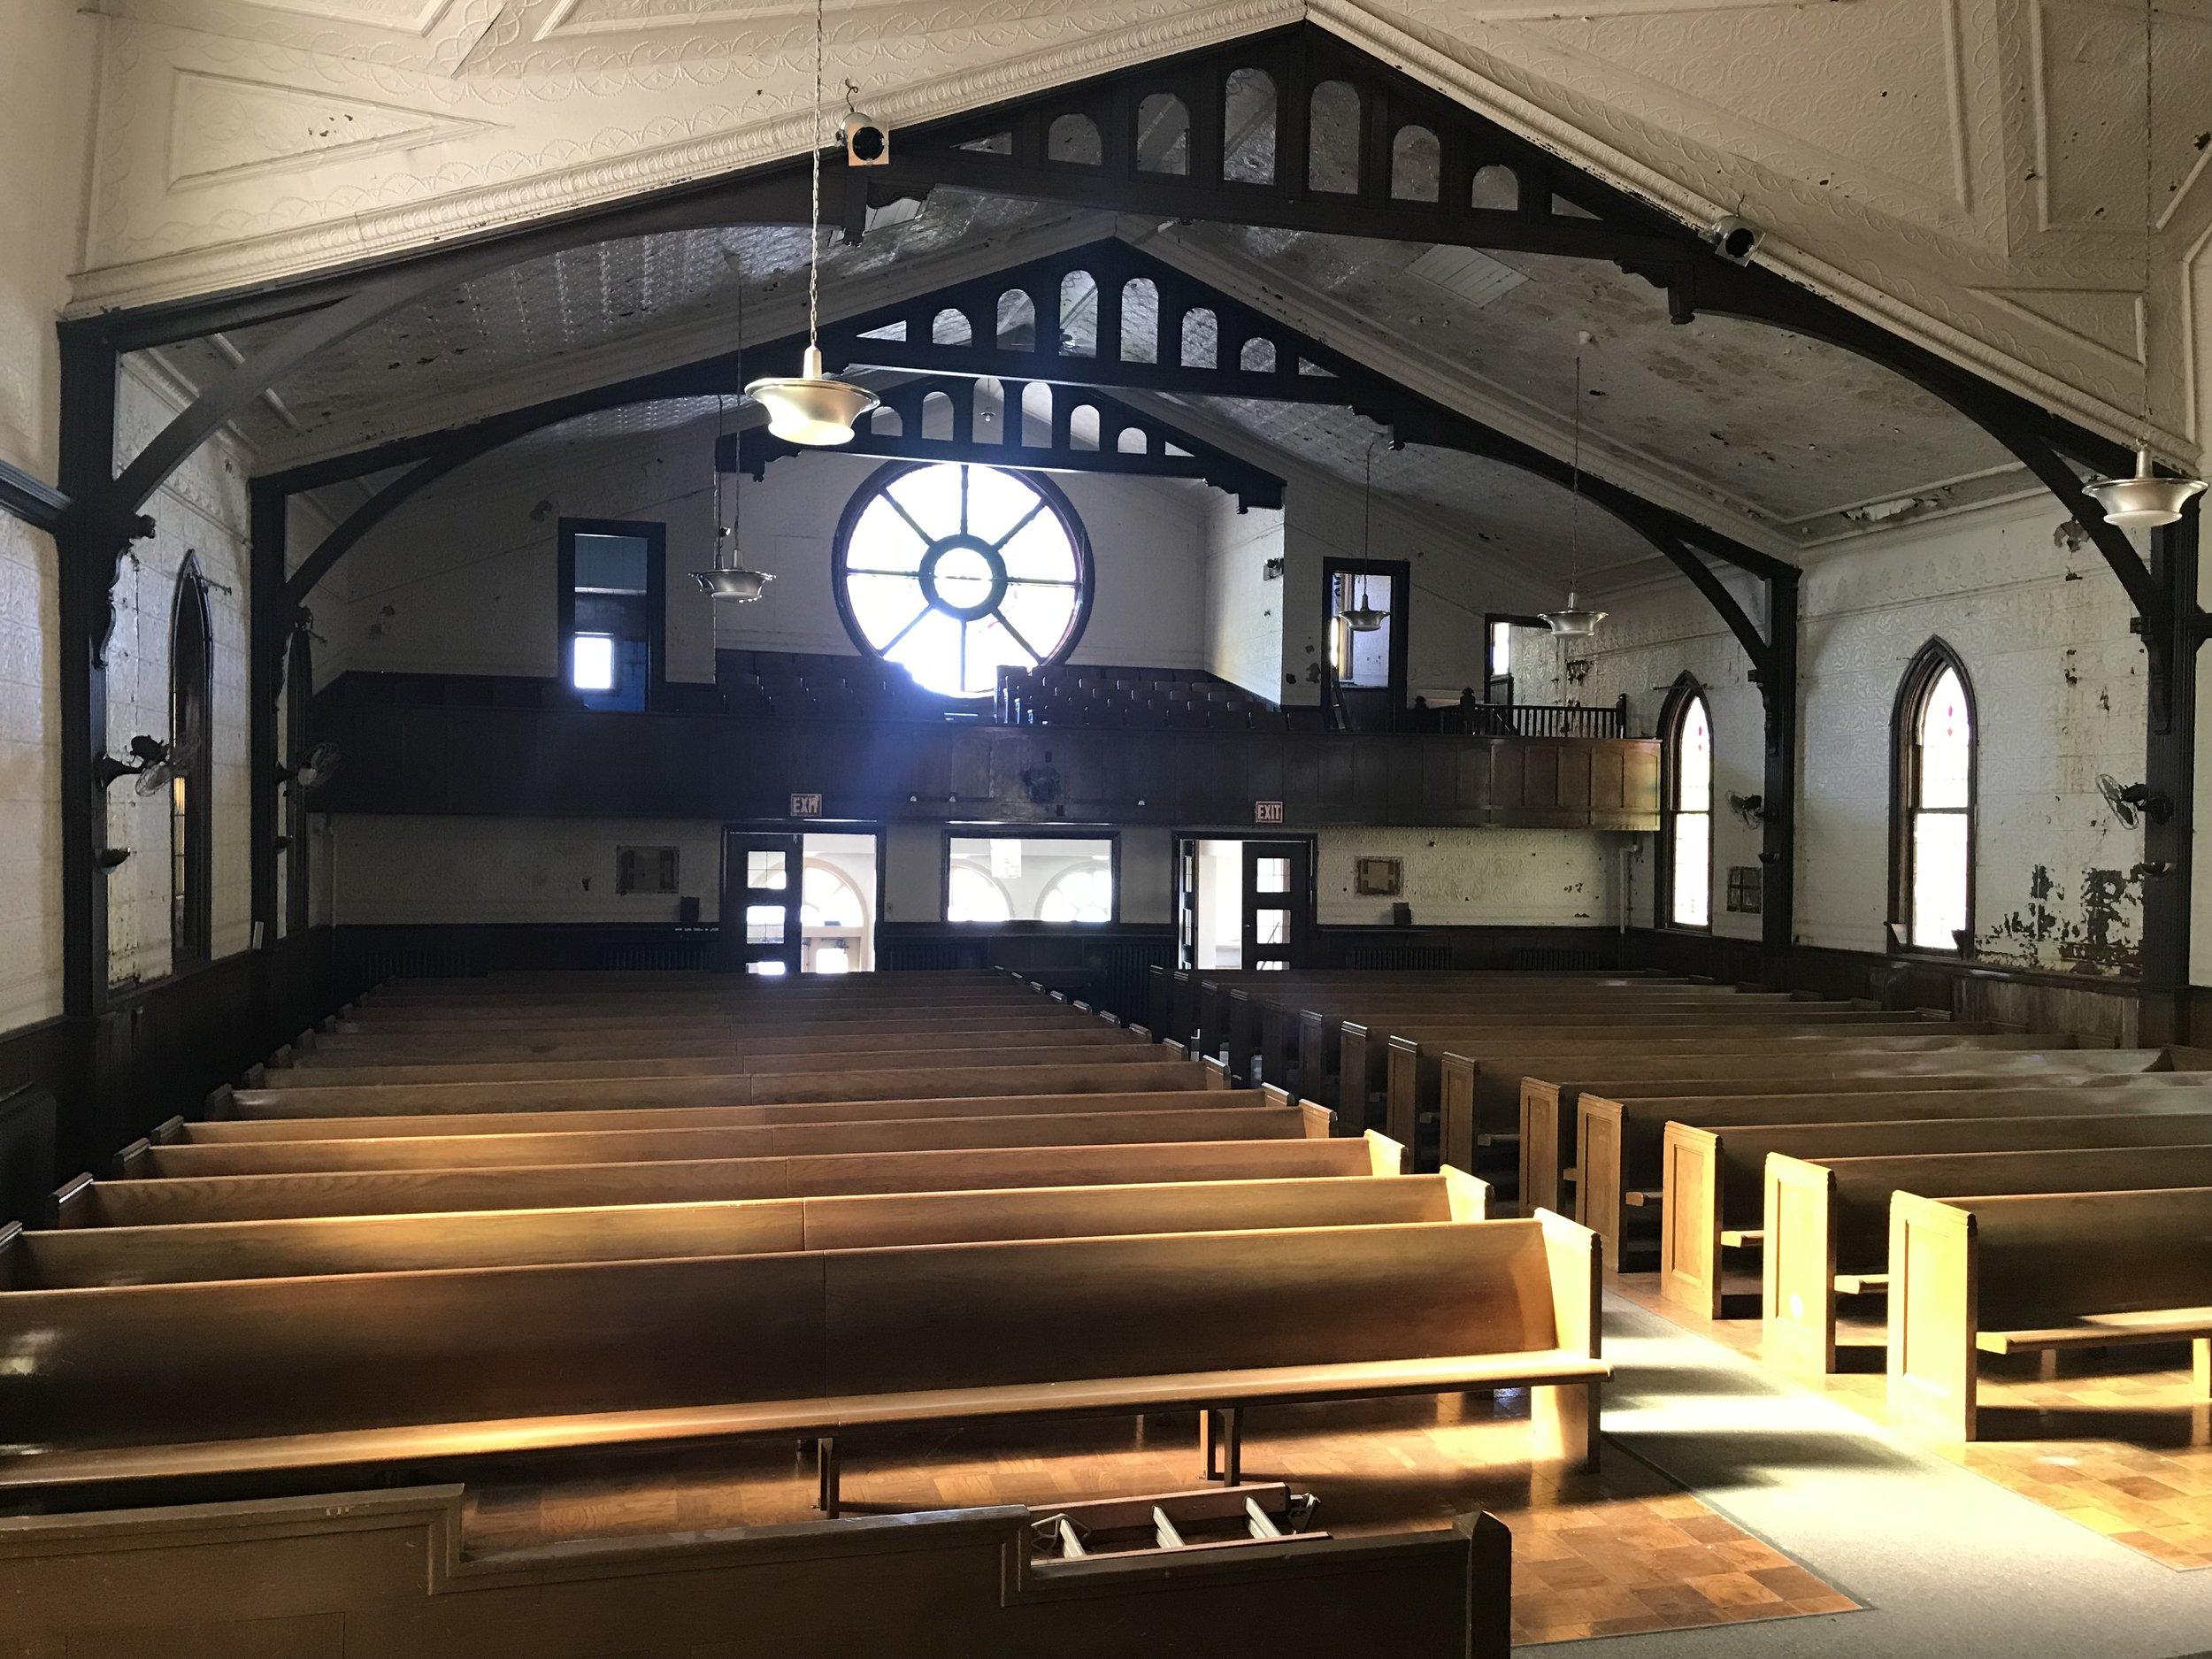 CHURCH - LOOKING BACK TOWARD BALCONY AND ROSETTE WINDOW.jpg